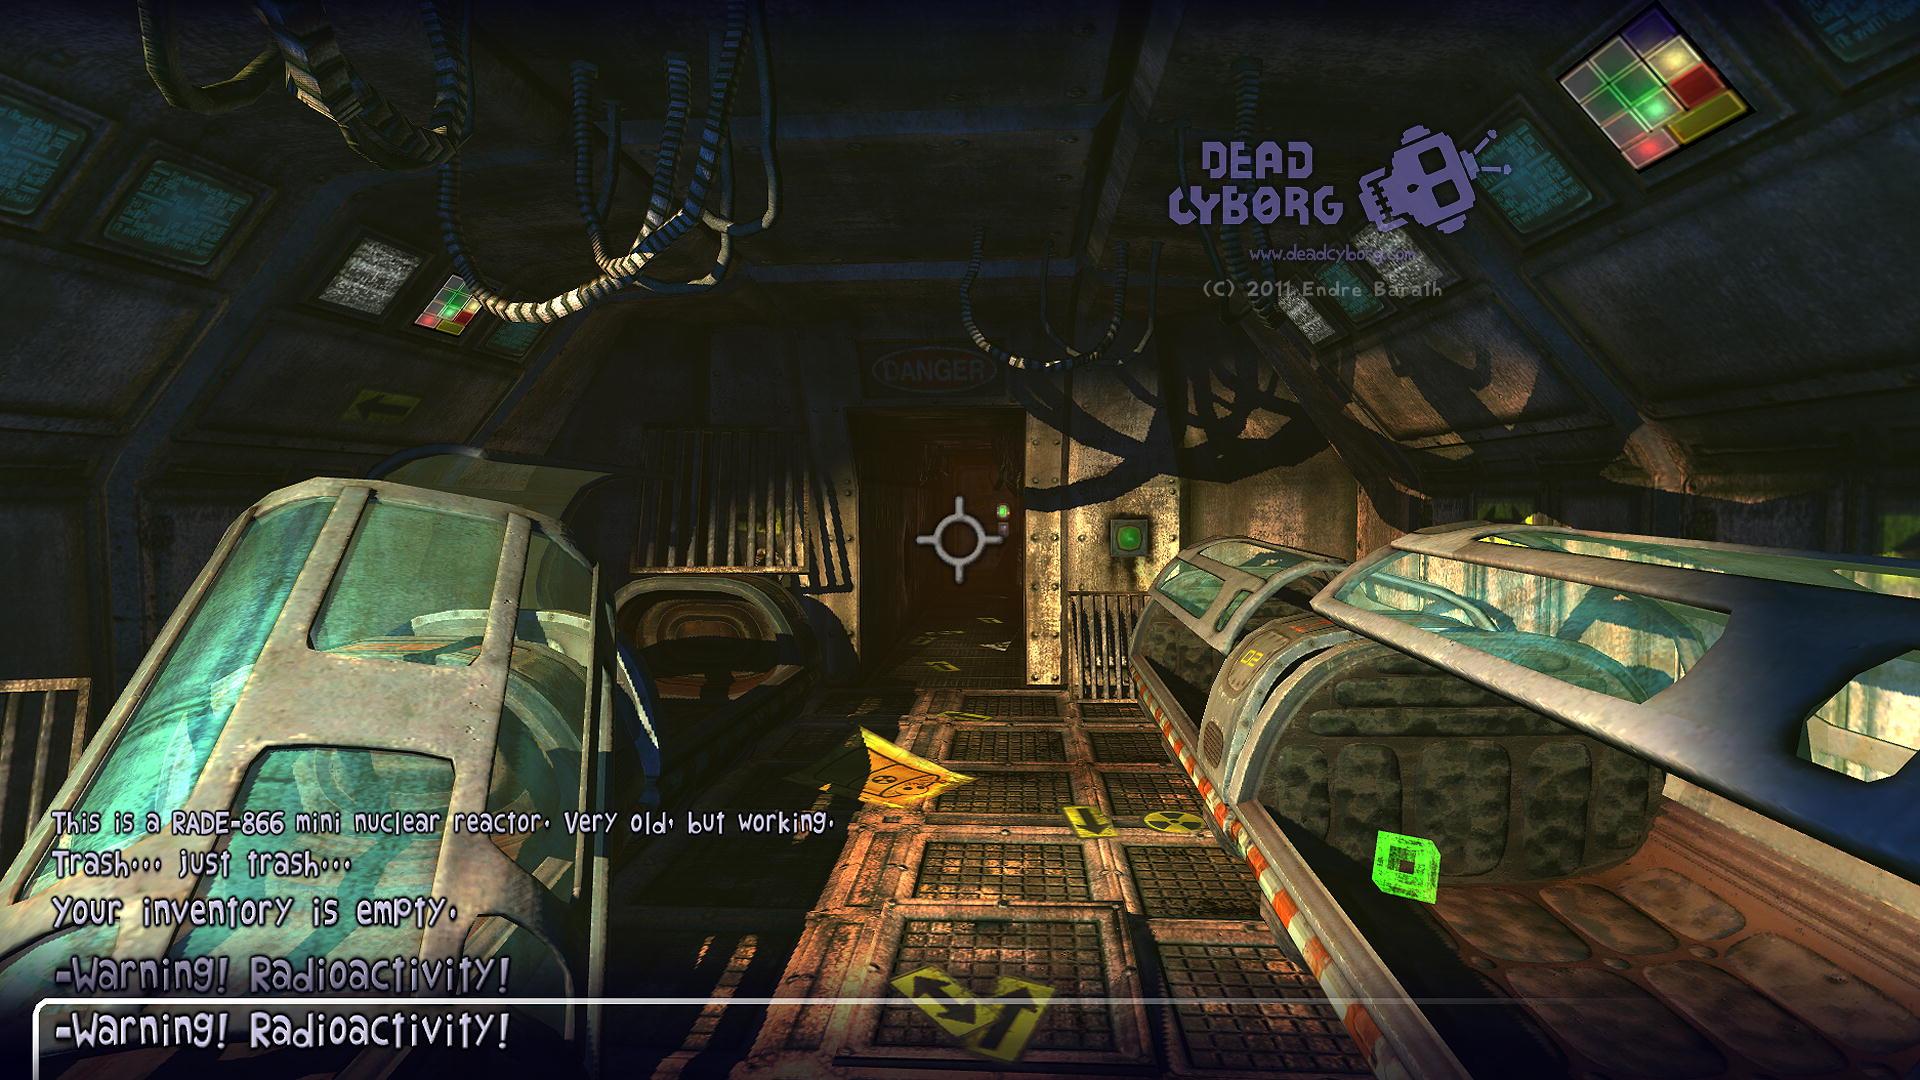 تحميل لعبة داي كاي بورج Dead Cyborg